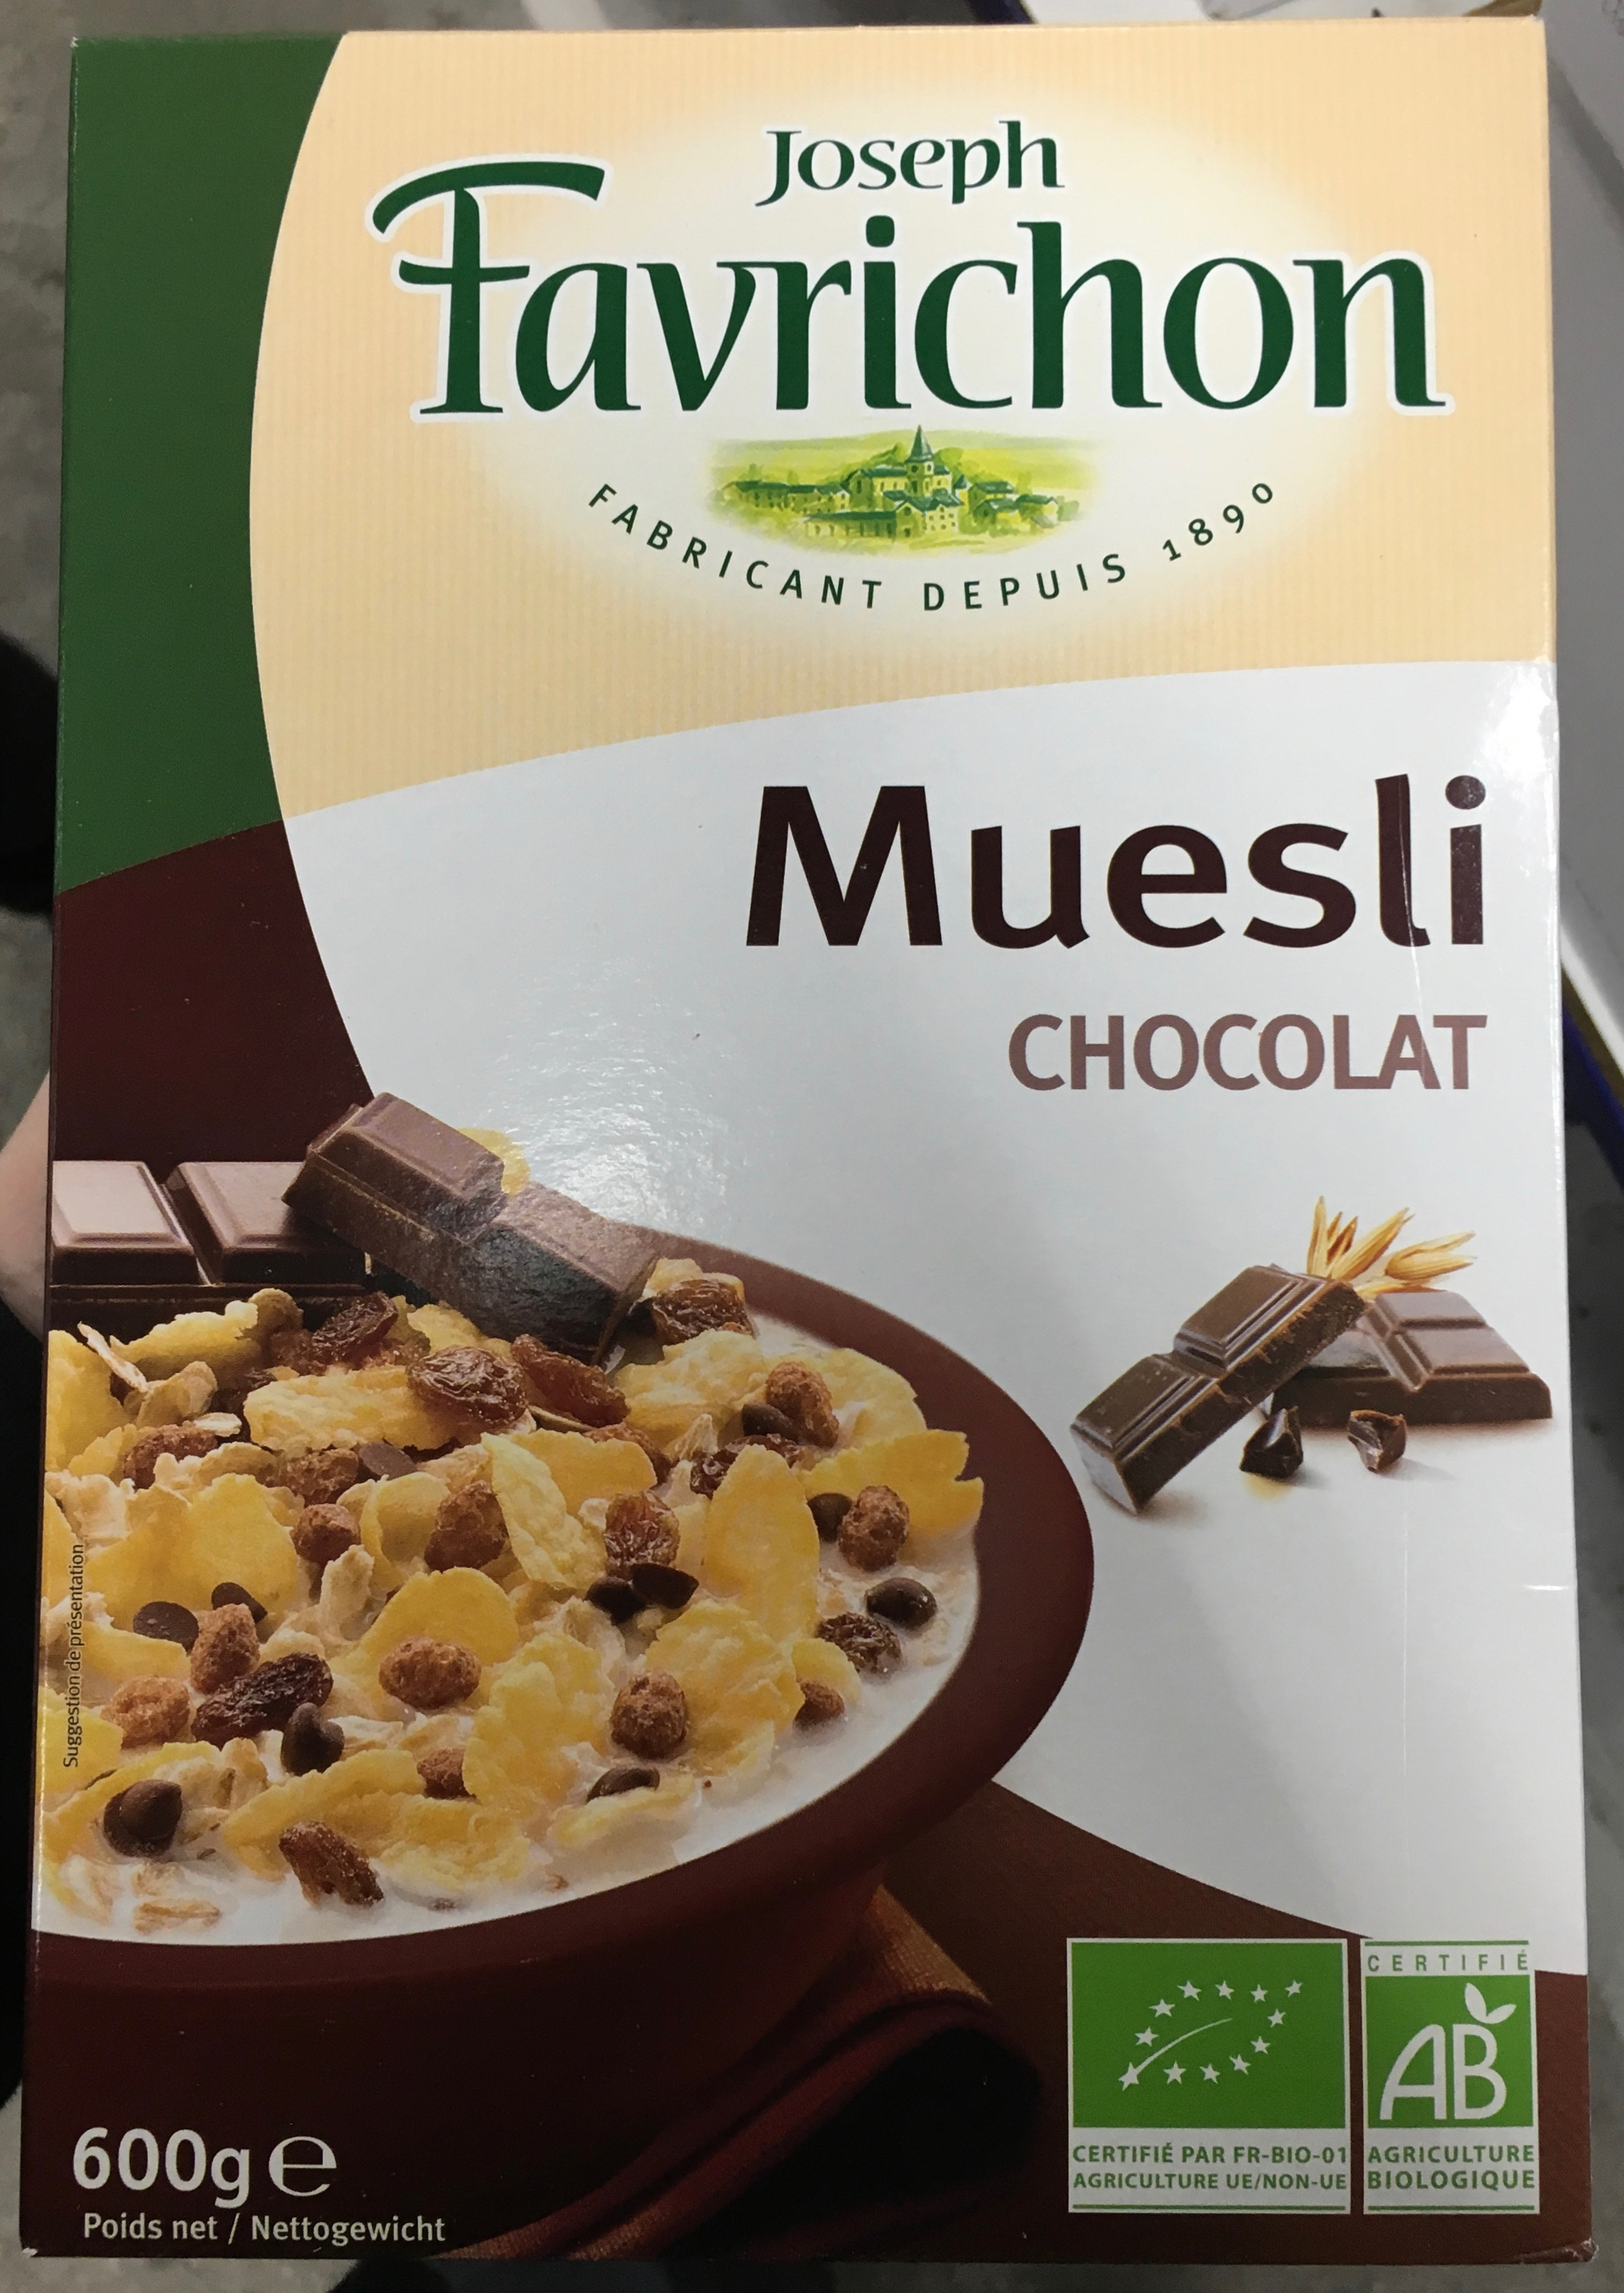 Muesli chocolat - Product - fr